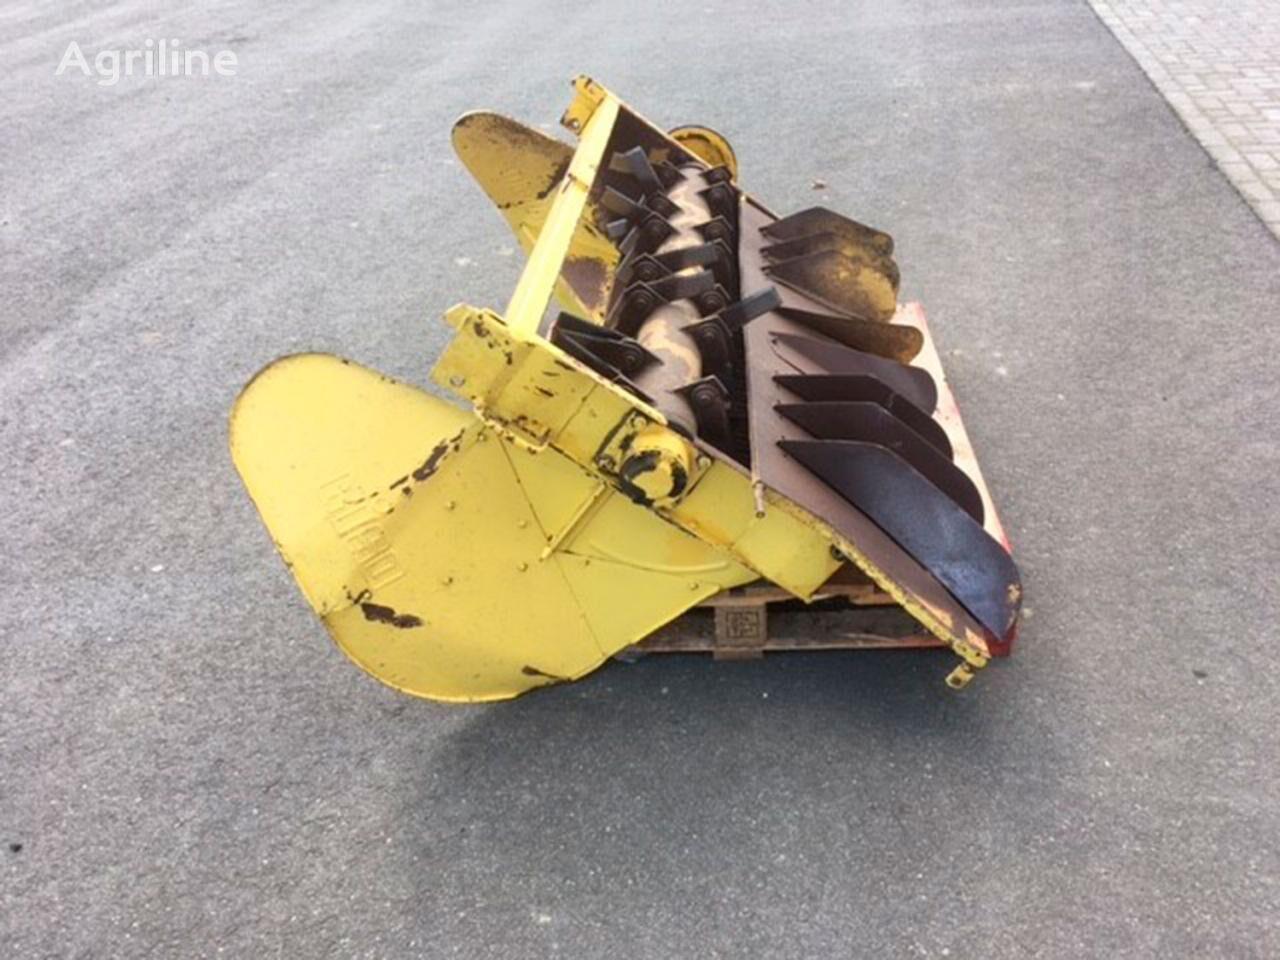 BISO hakselaar chopper for NEW HOLLAND 8070 grain harvester